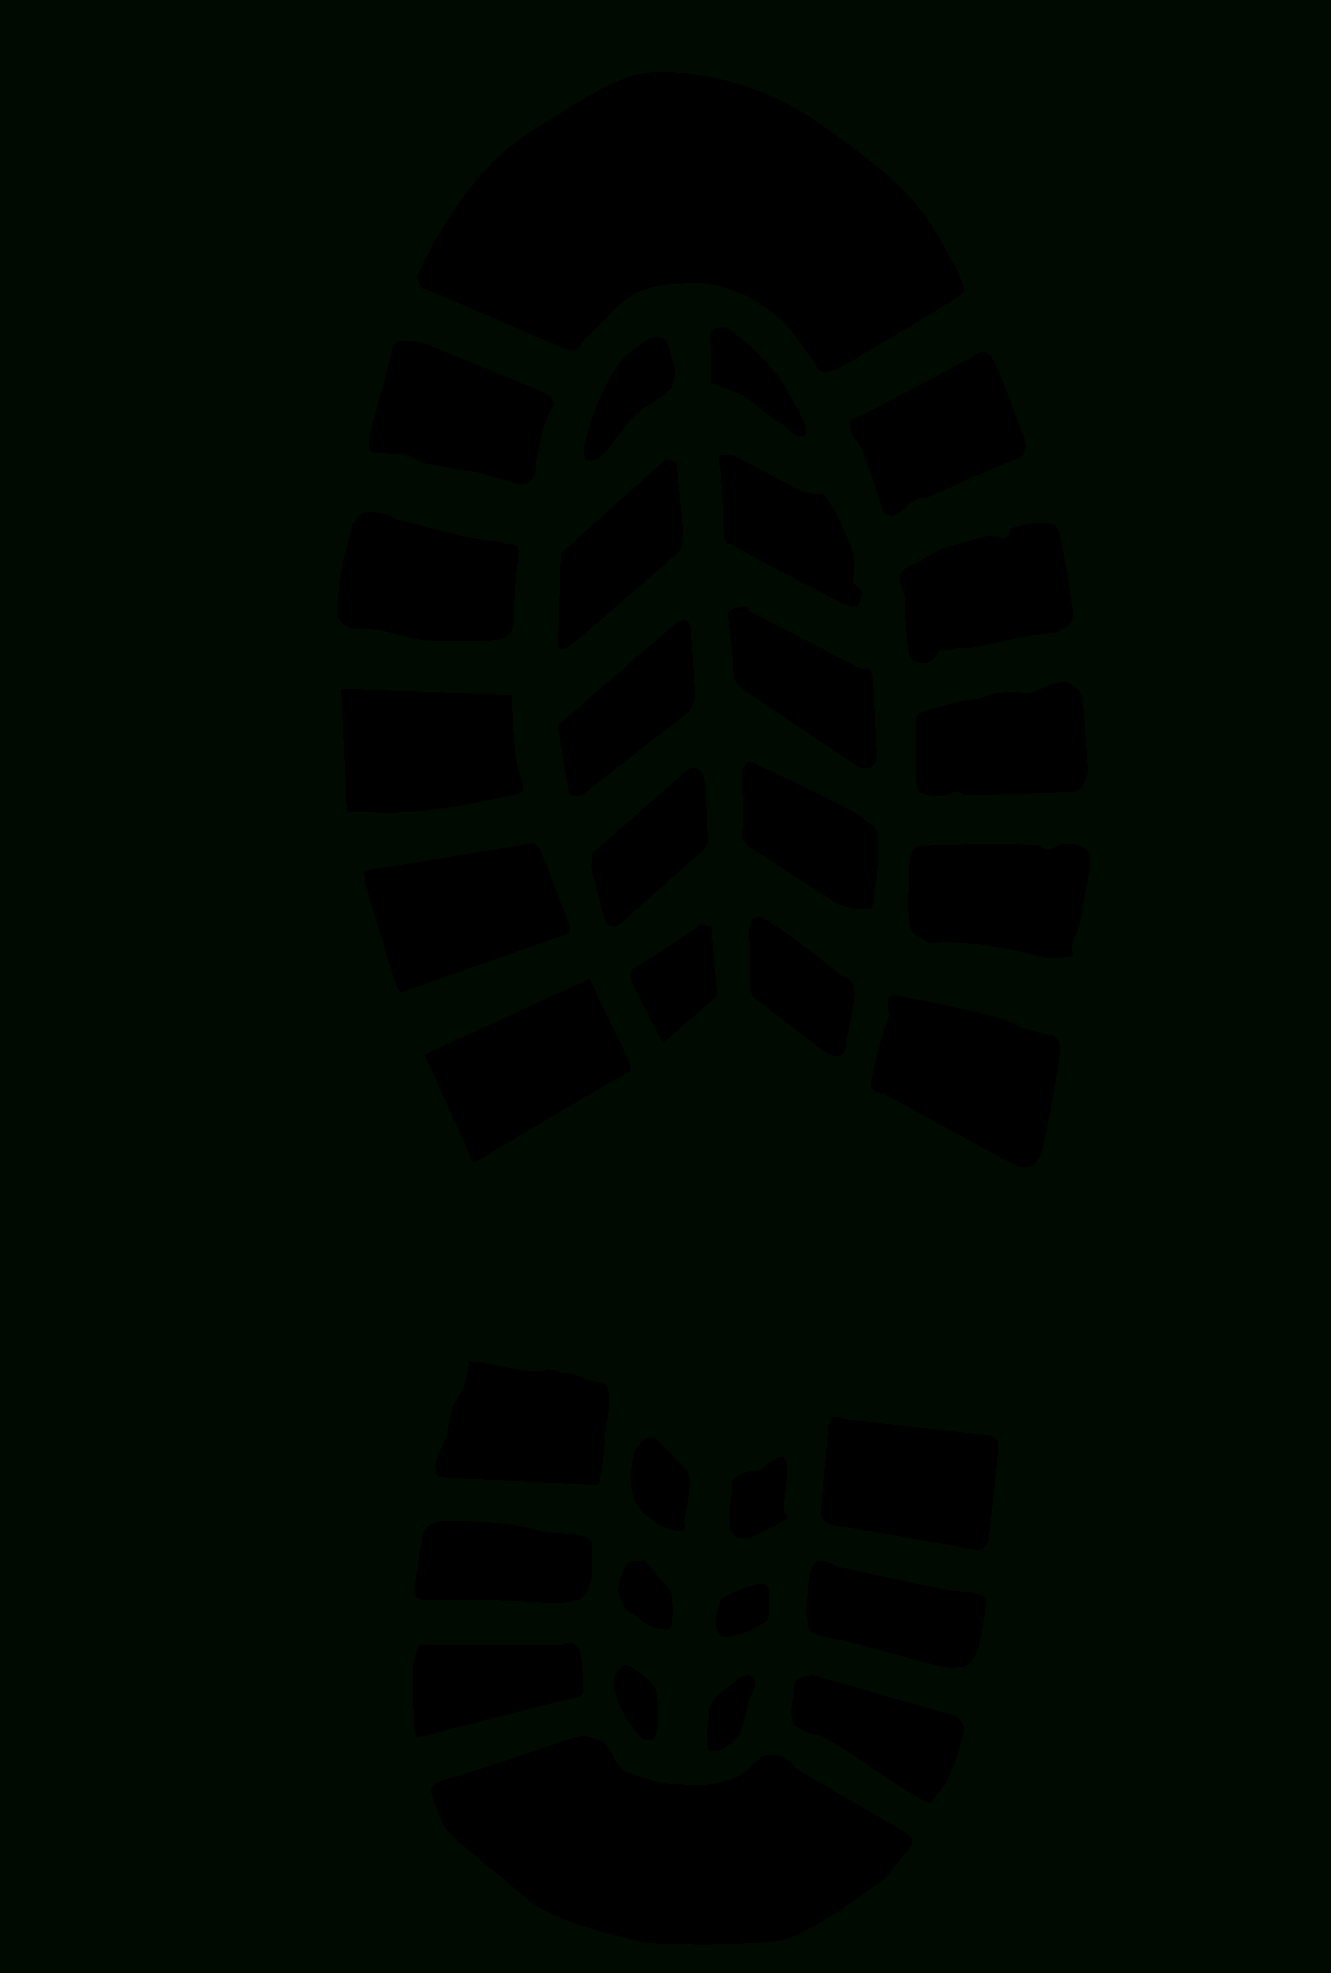 Boot Prints | School | Footprint, Shoes, Templates Printable Free - Free Printable Shoe Print Template